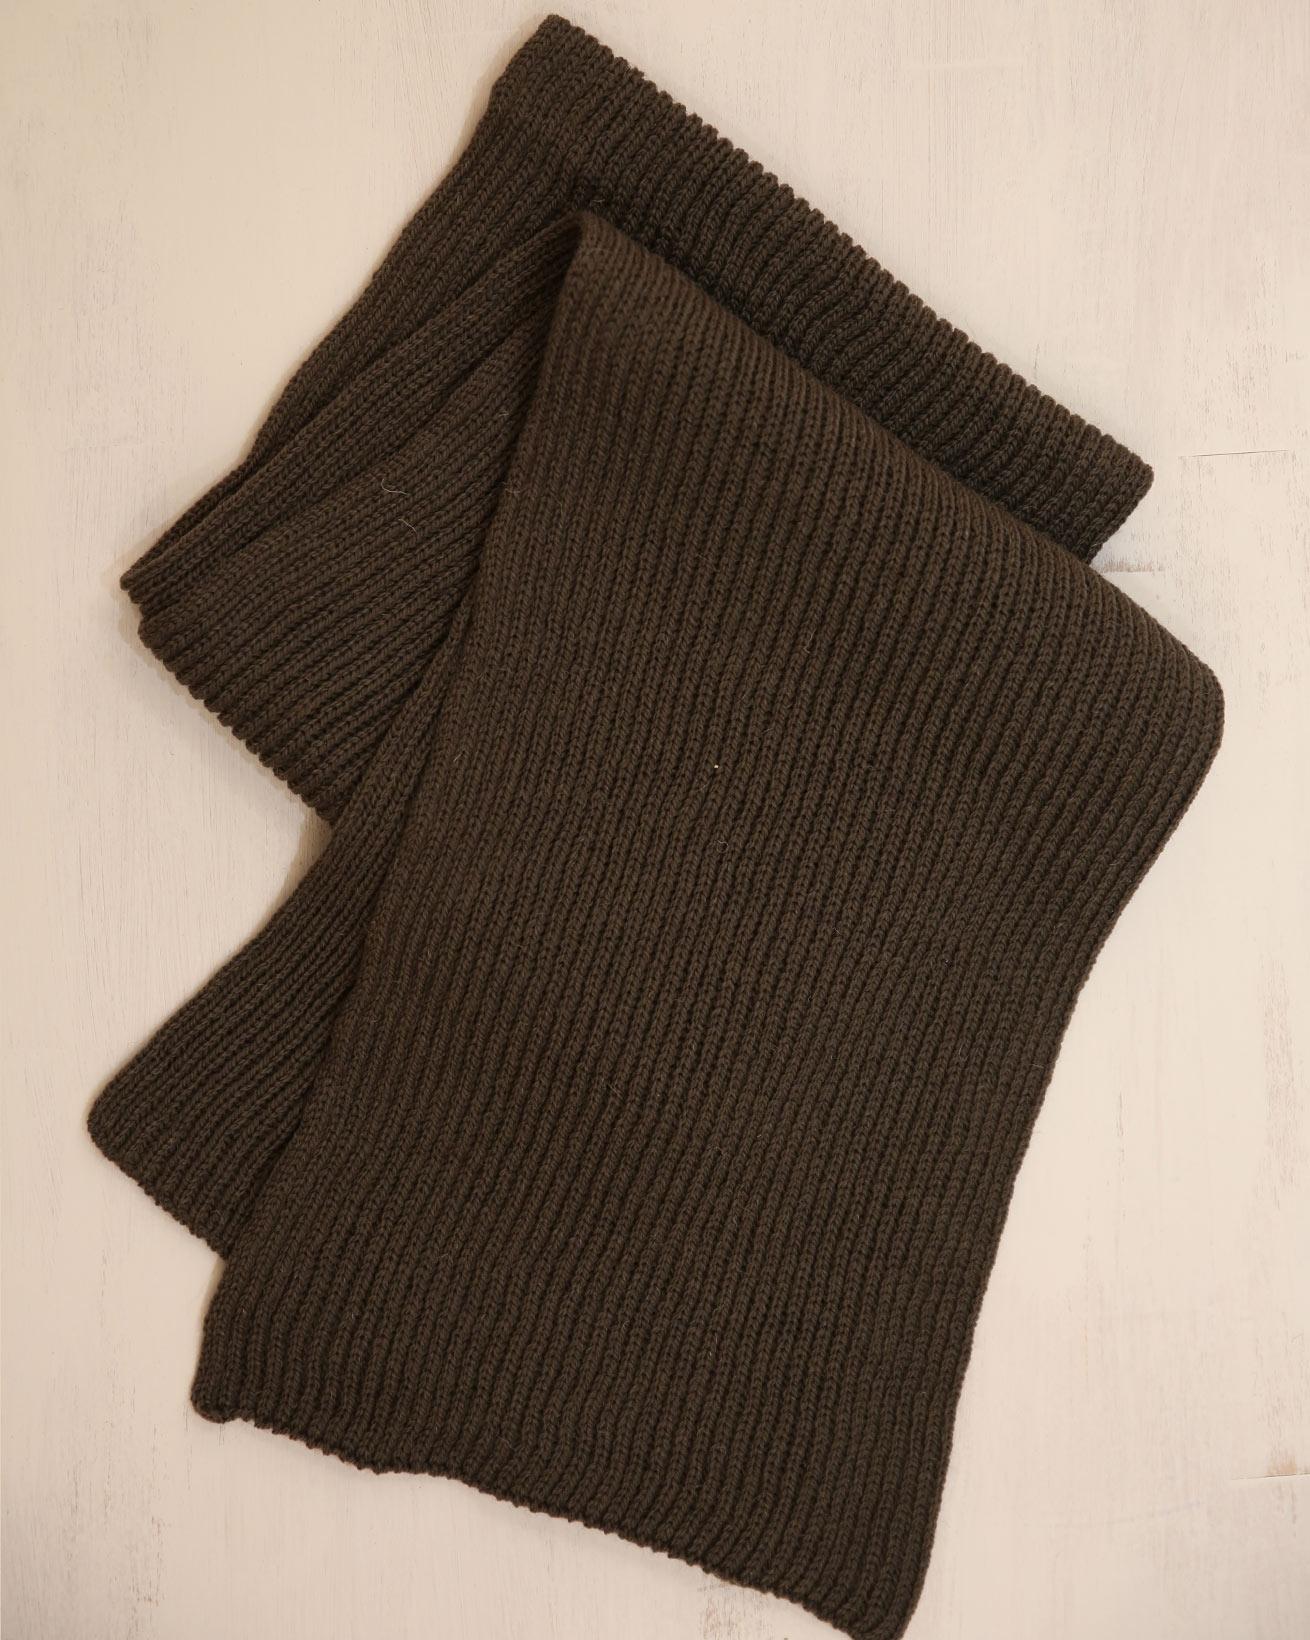 Ladies Rib Scarf - One Size - Khaki - 2331